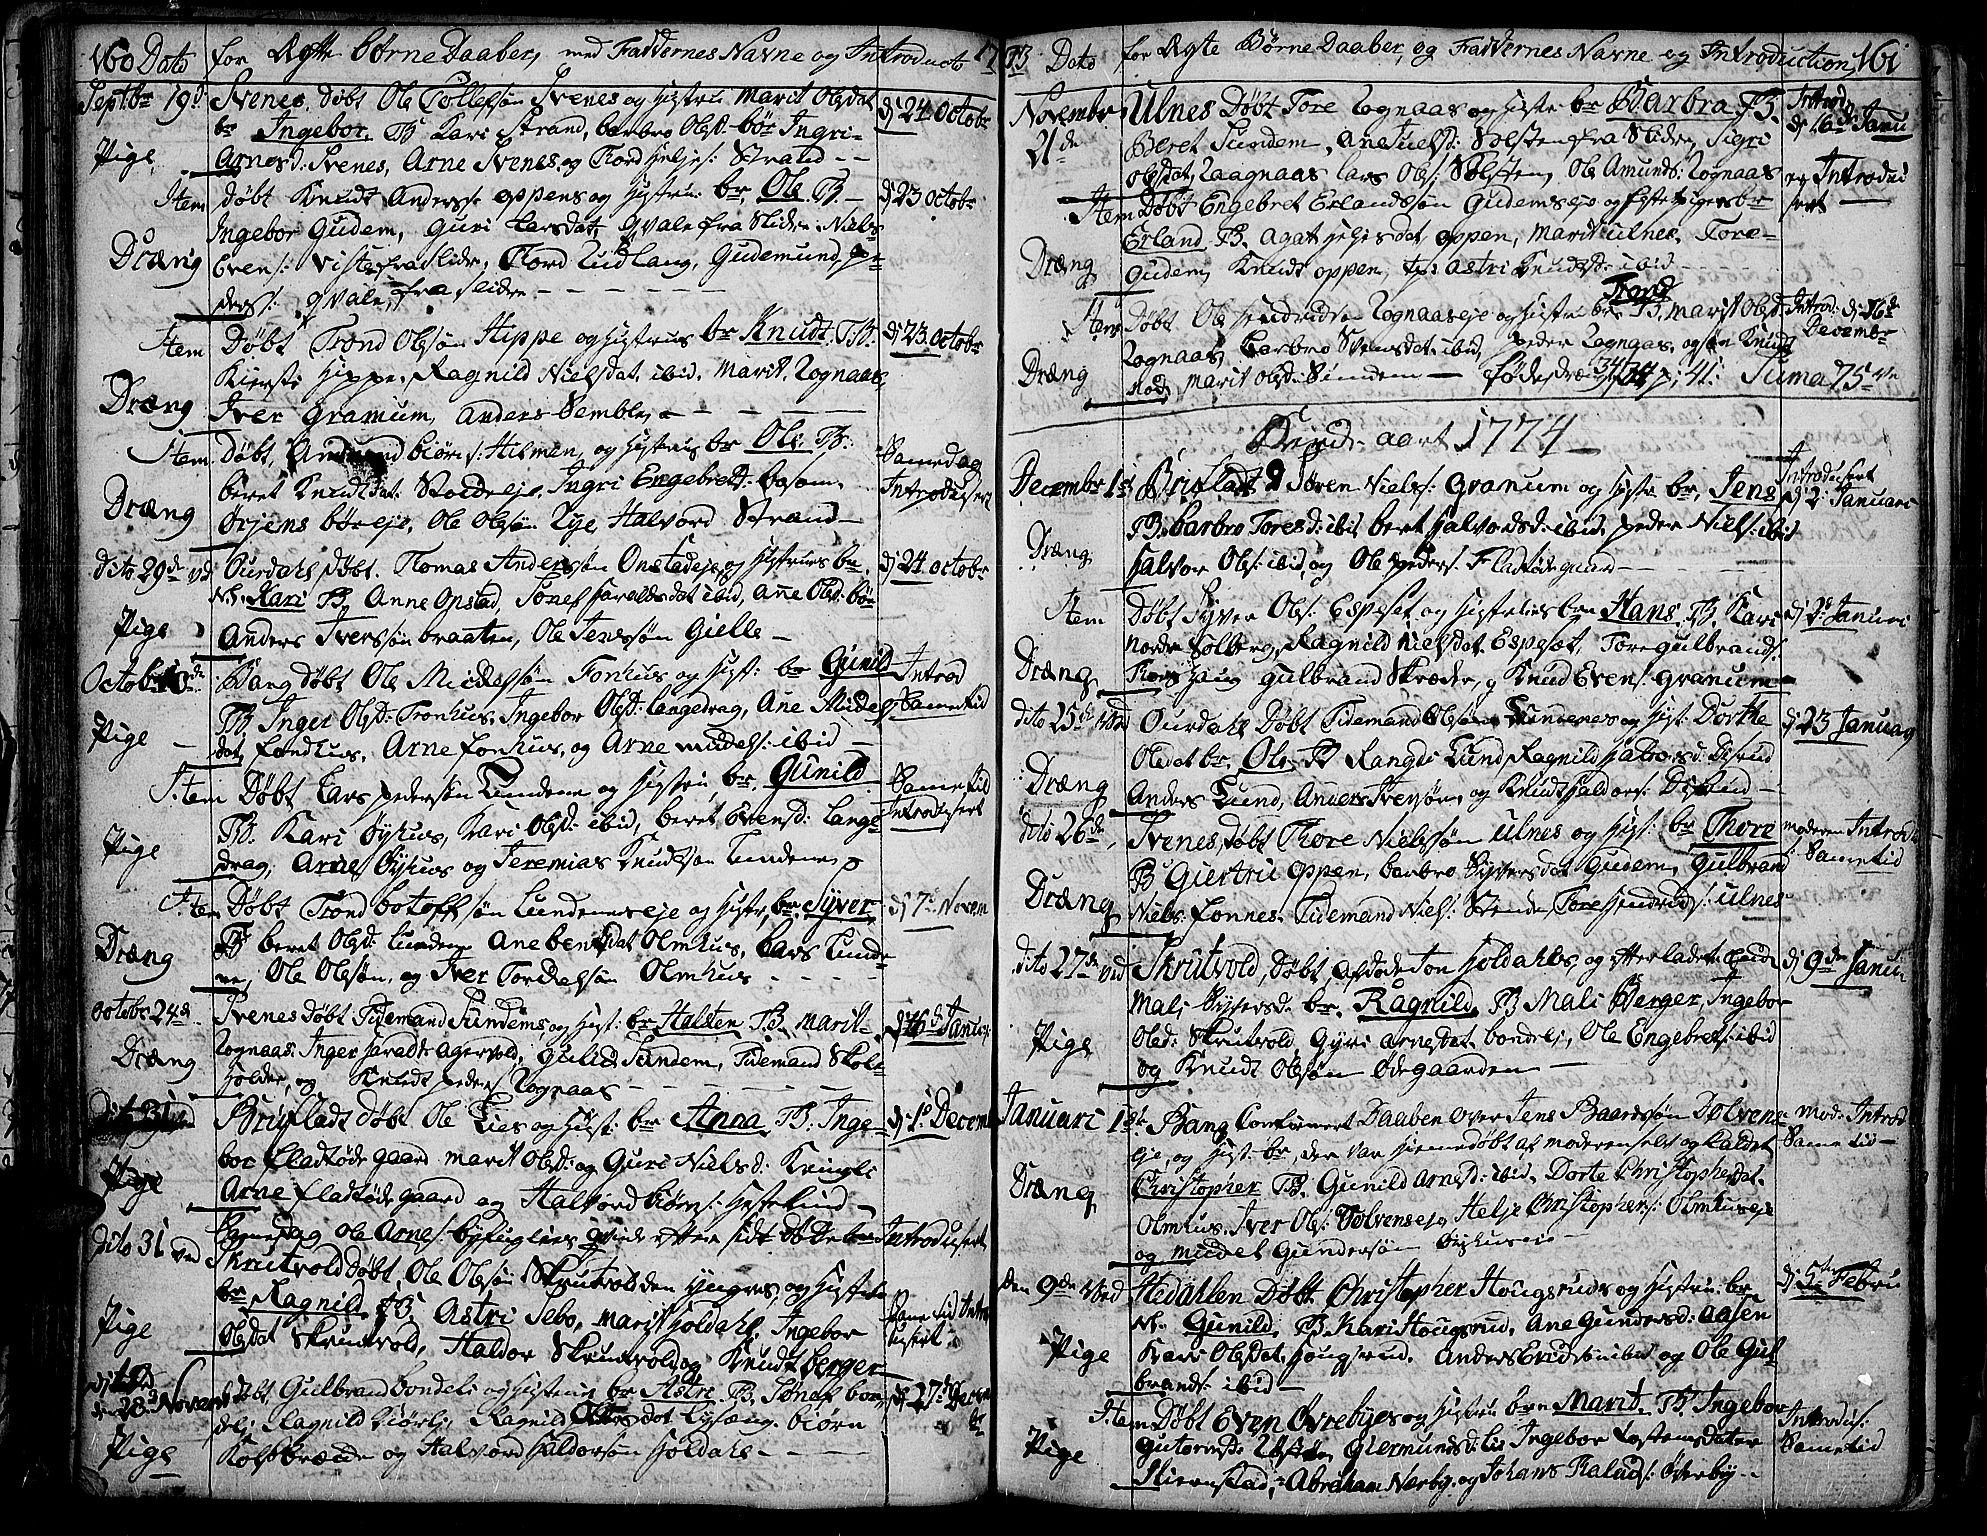 SAH, Aurdal prestekontor, Ministerialbok nr. 5, 1763-1781, s. 160-161